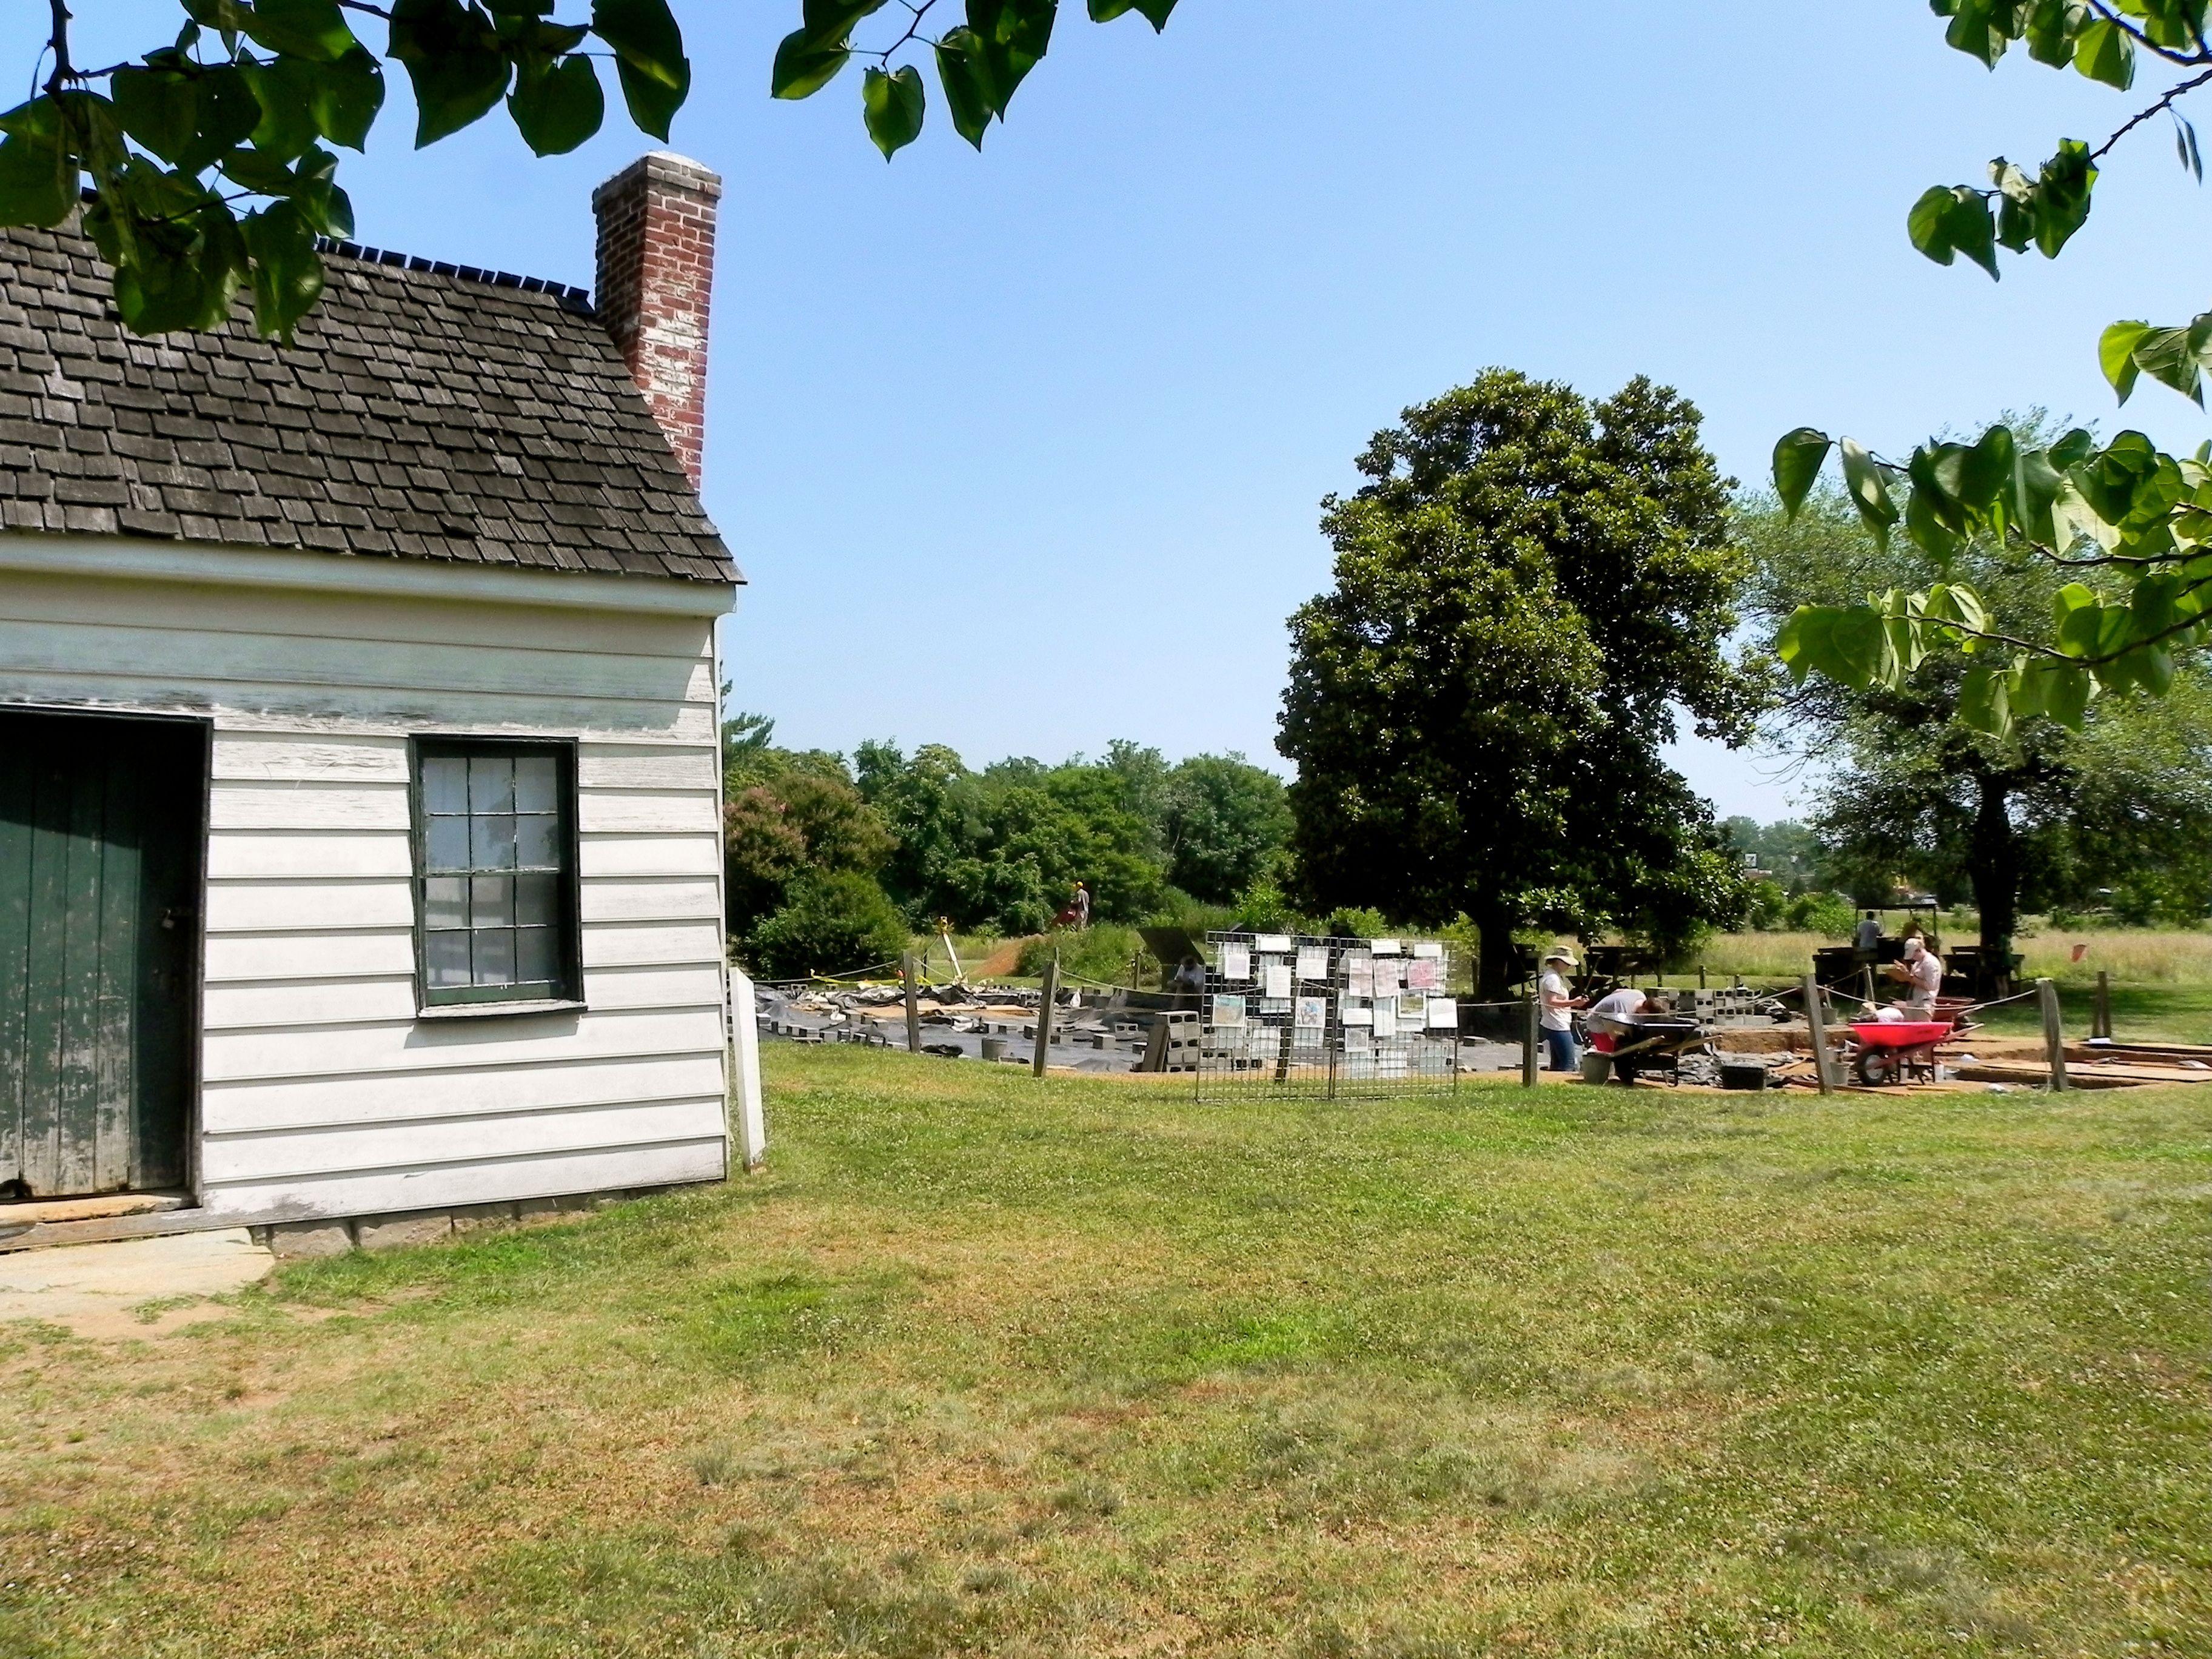 Ferry Farm, George Washington's childhood home in Fredericksburg ...